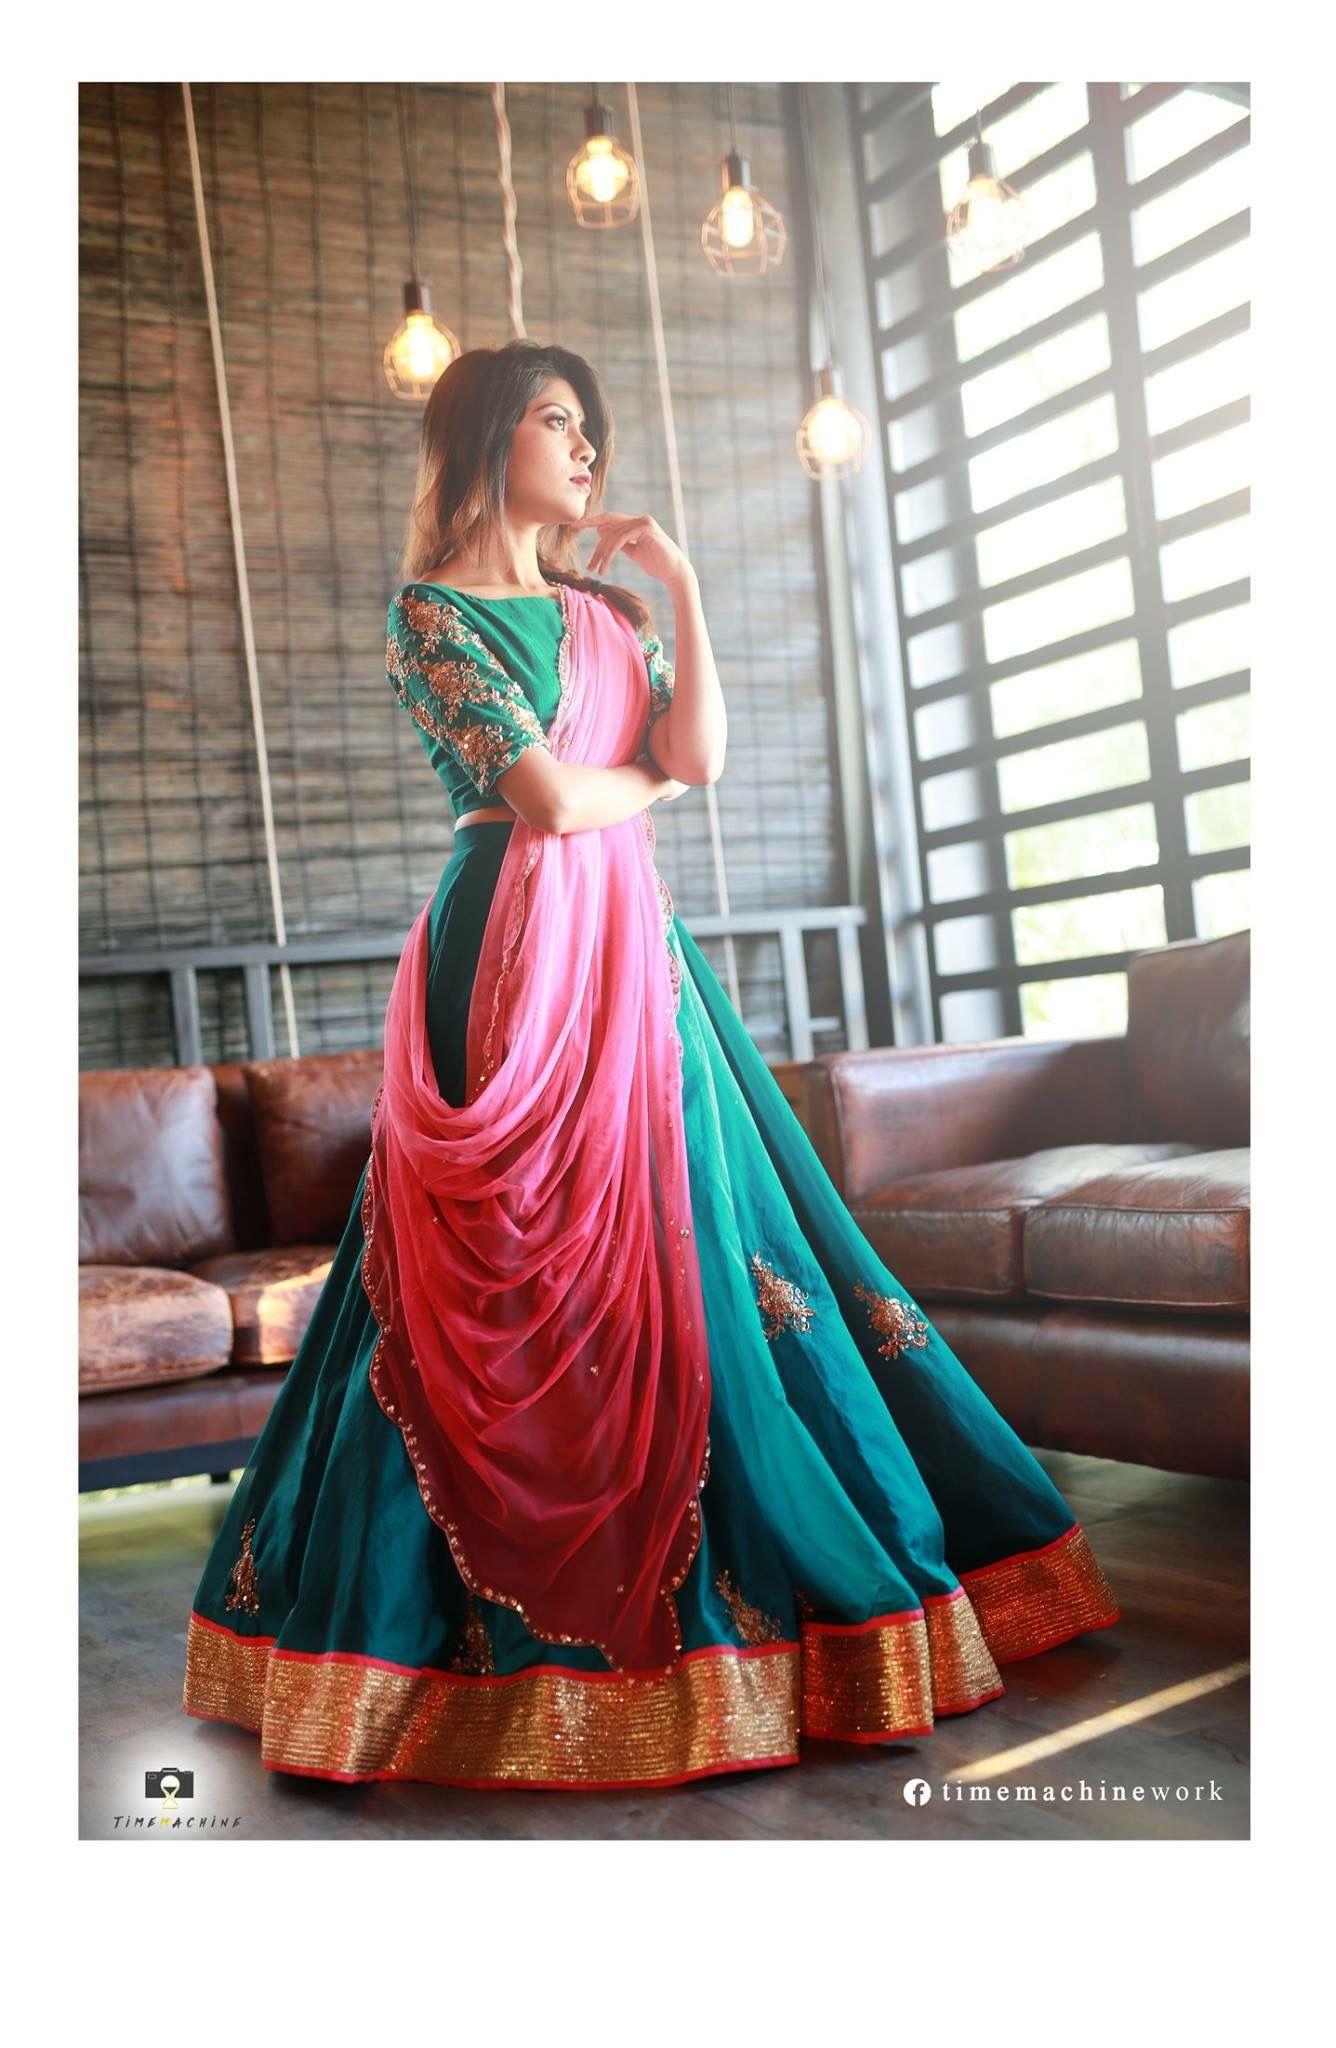 Pin By Affu On Dresses Sarees Lehangas Half Saree Designs Indian Outfits Designer Dresses Indian